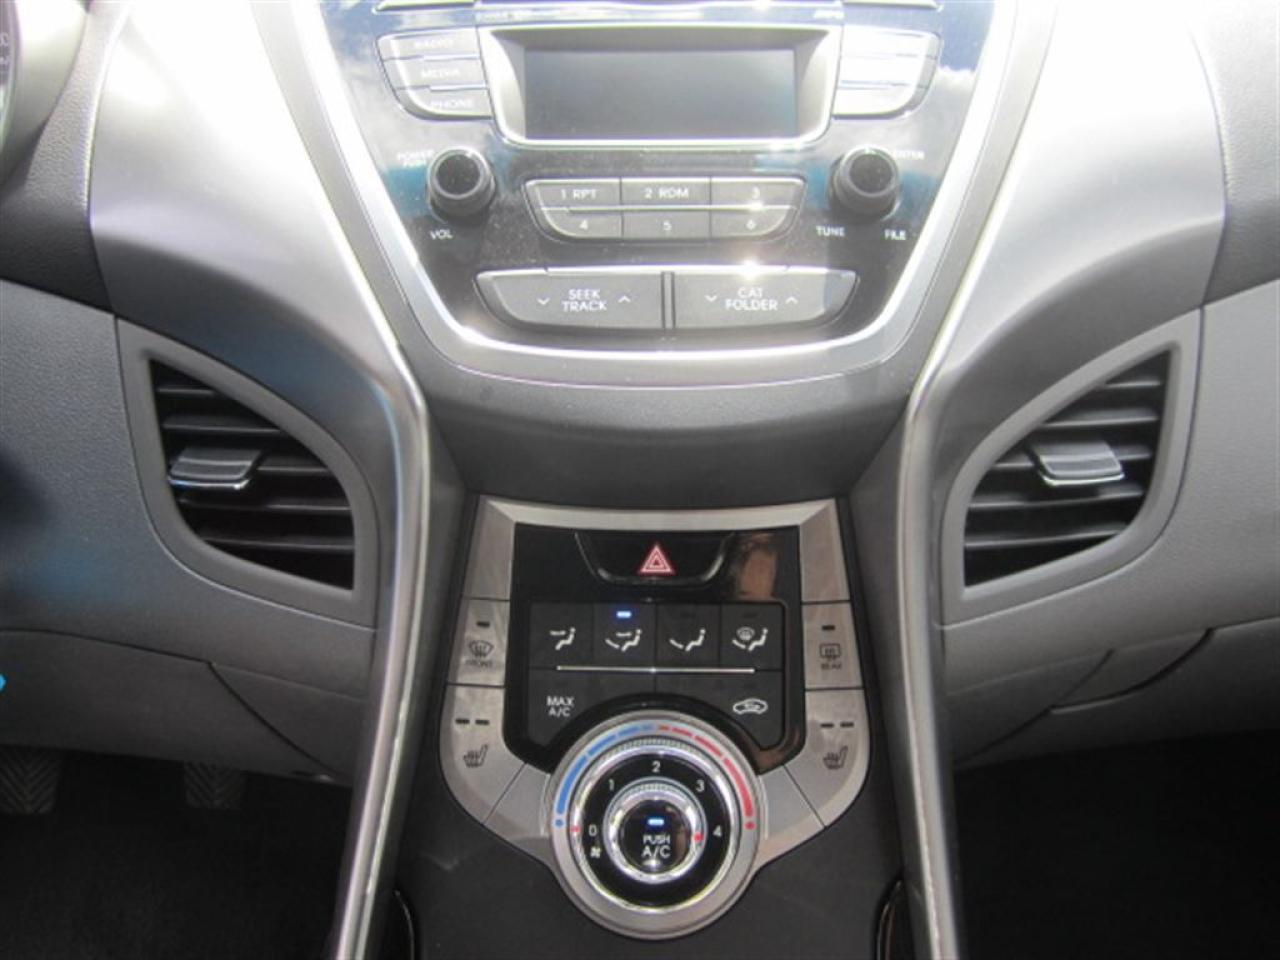 2013 Hyundai Elantra GLS-SUNROOF-ALLOYS-SUPER CLEAN